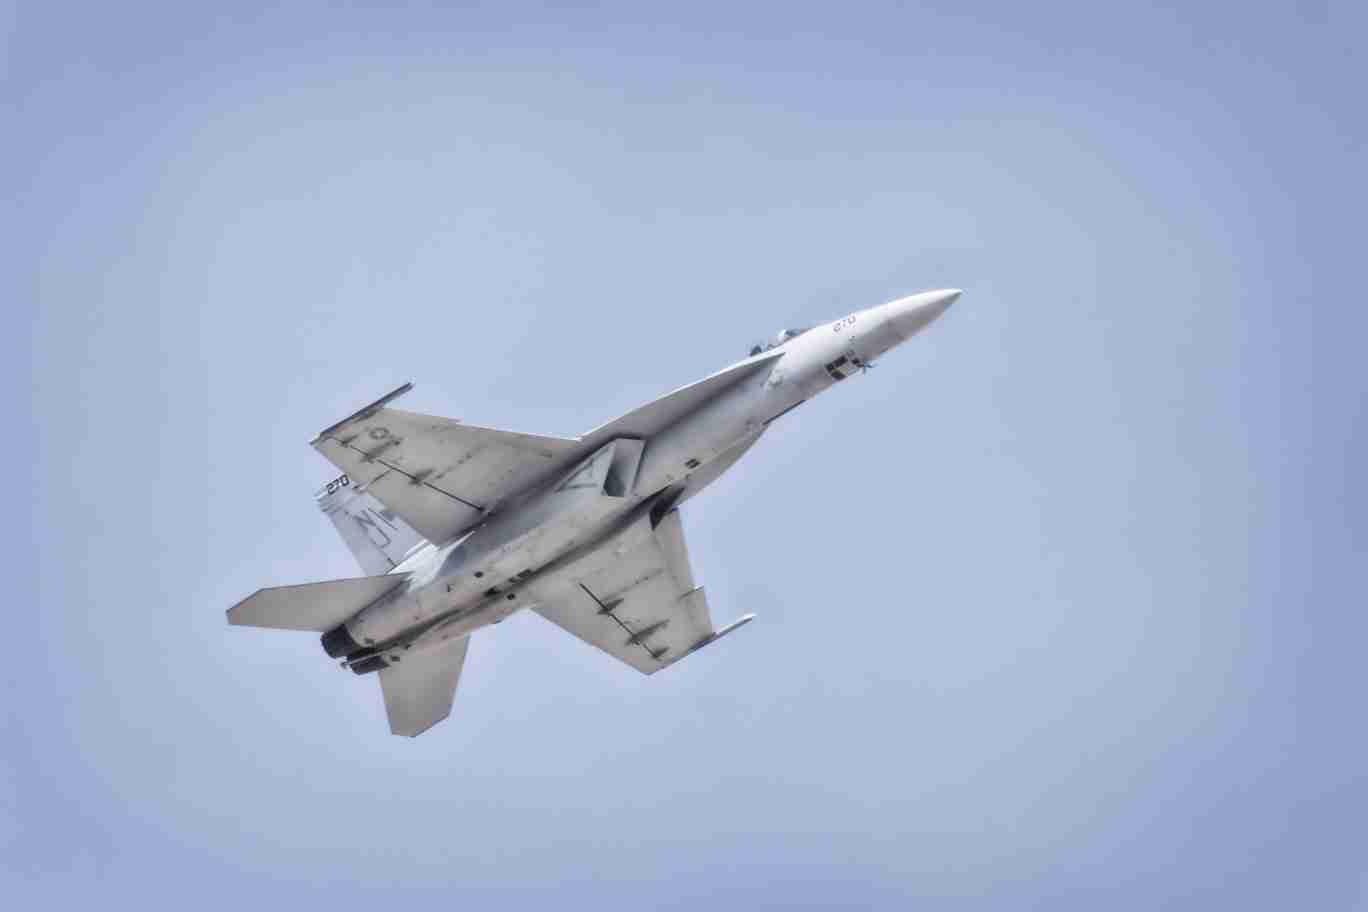 F/A-18 Super Hornet Flying Upward